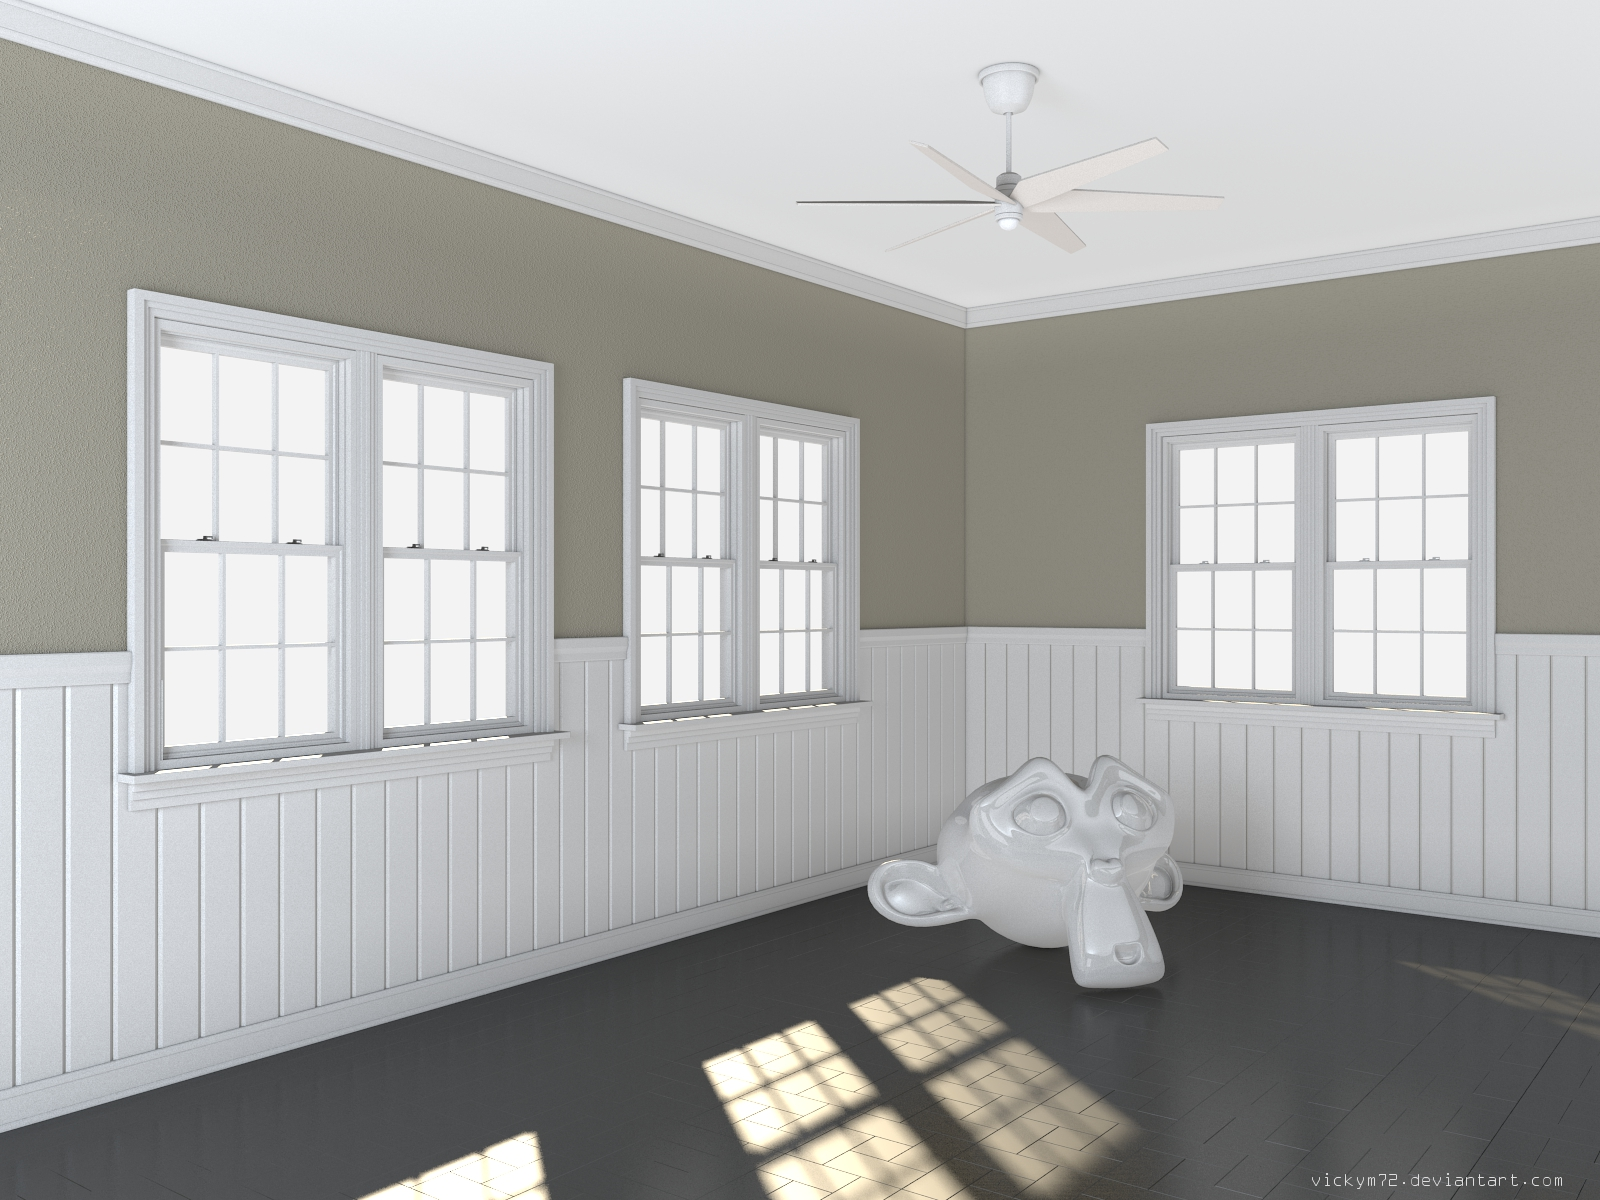 Interior Lighting Test by VickyM72